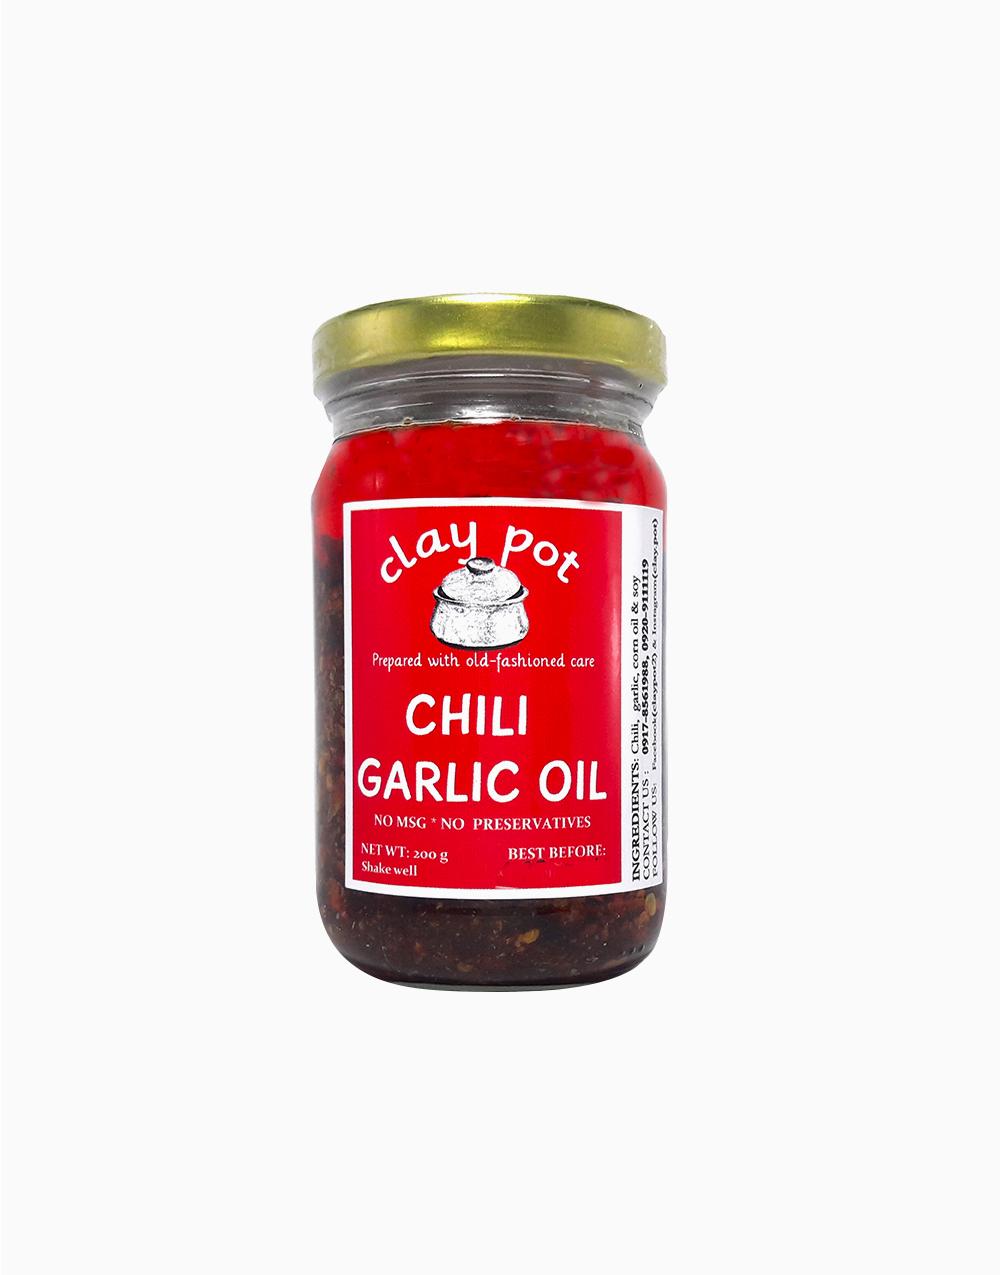 Chili Garlic Oil by Clay Pot